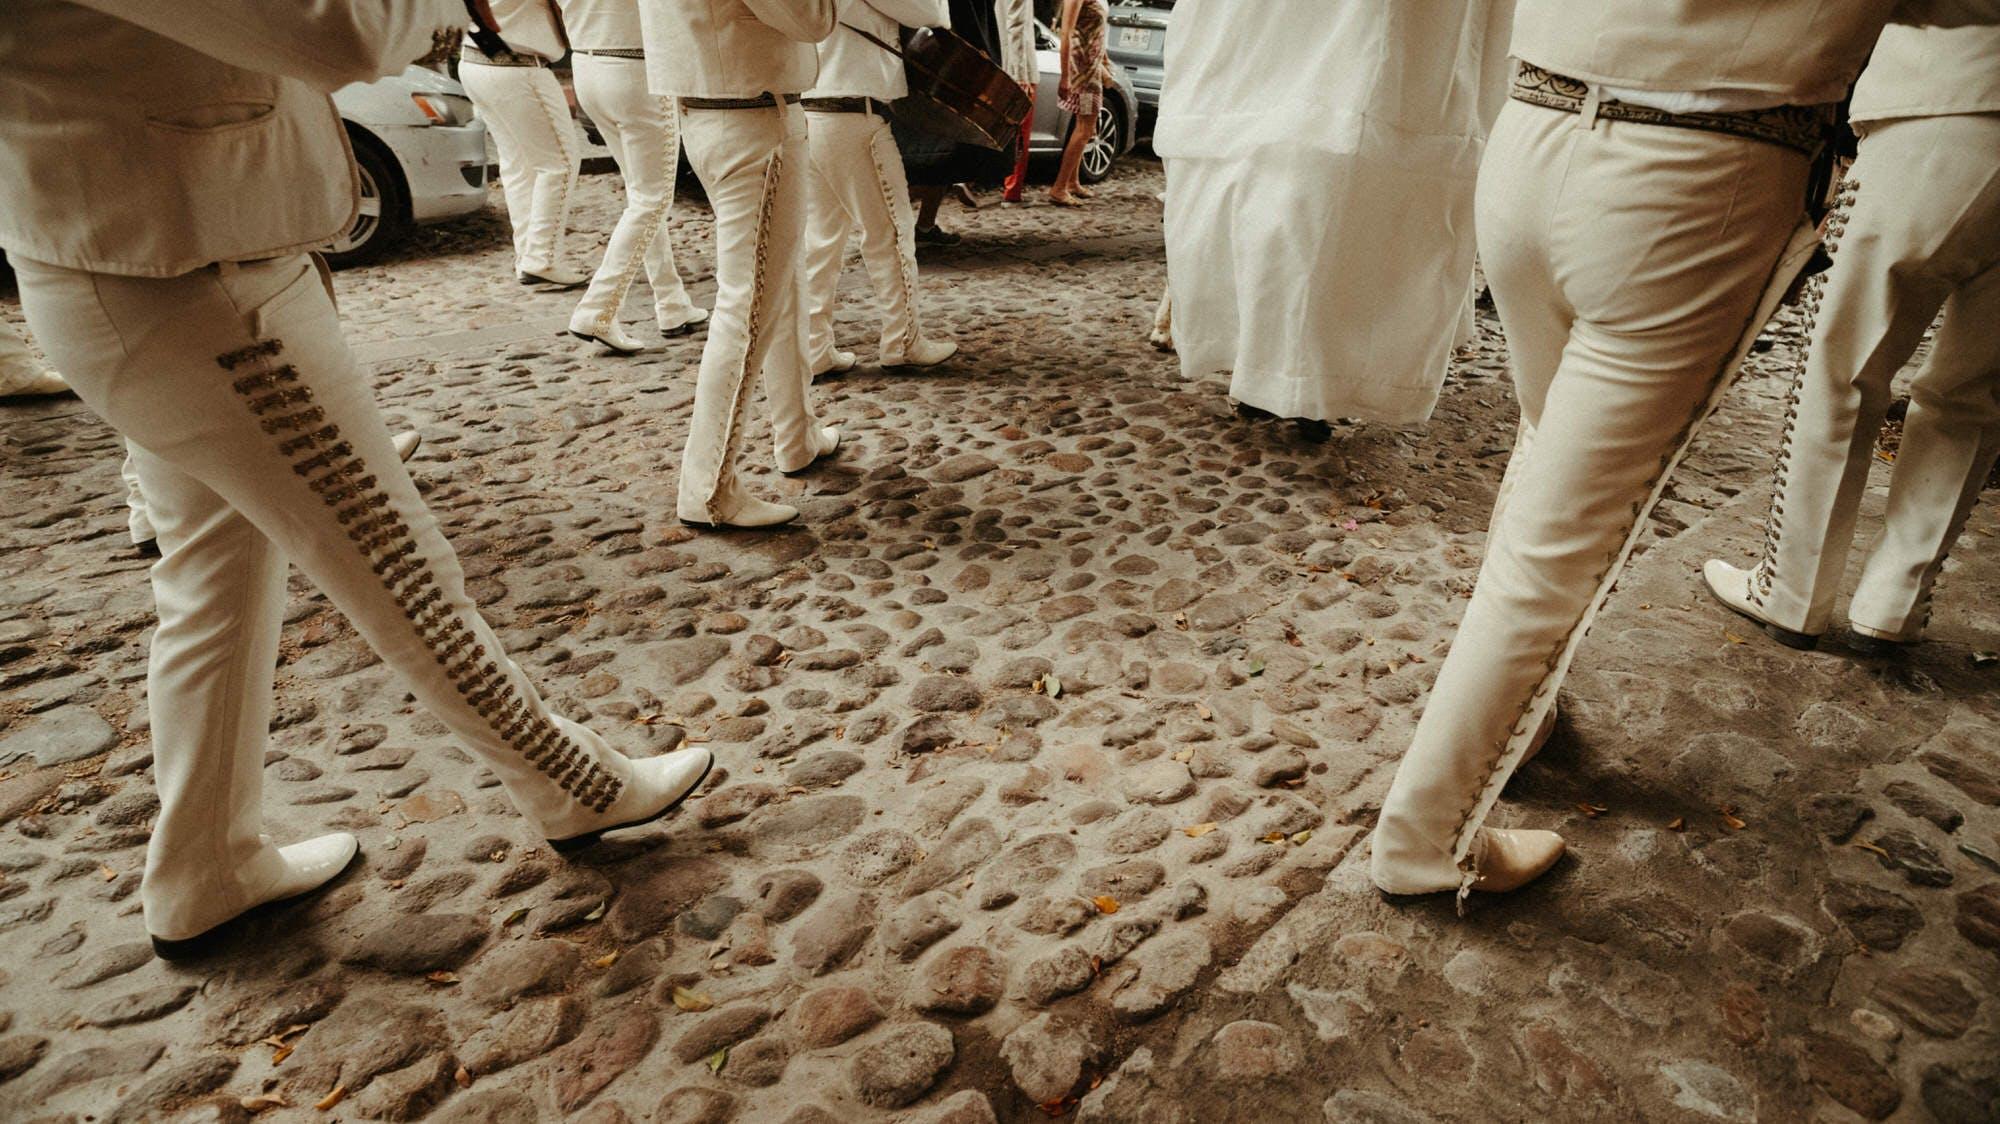 san miguel mexican parade down cobblestone streets